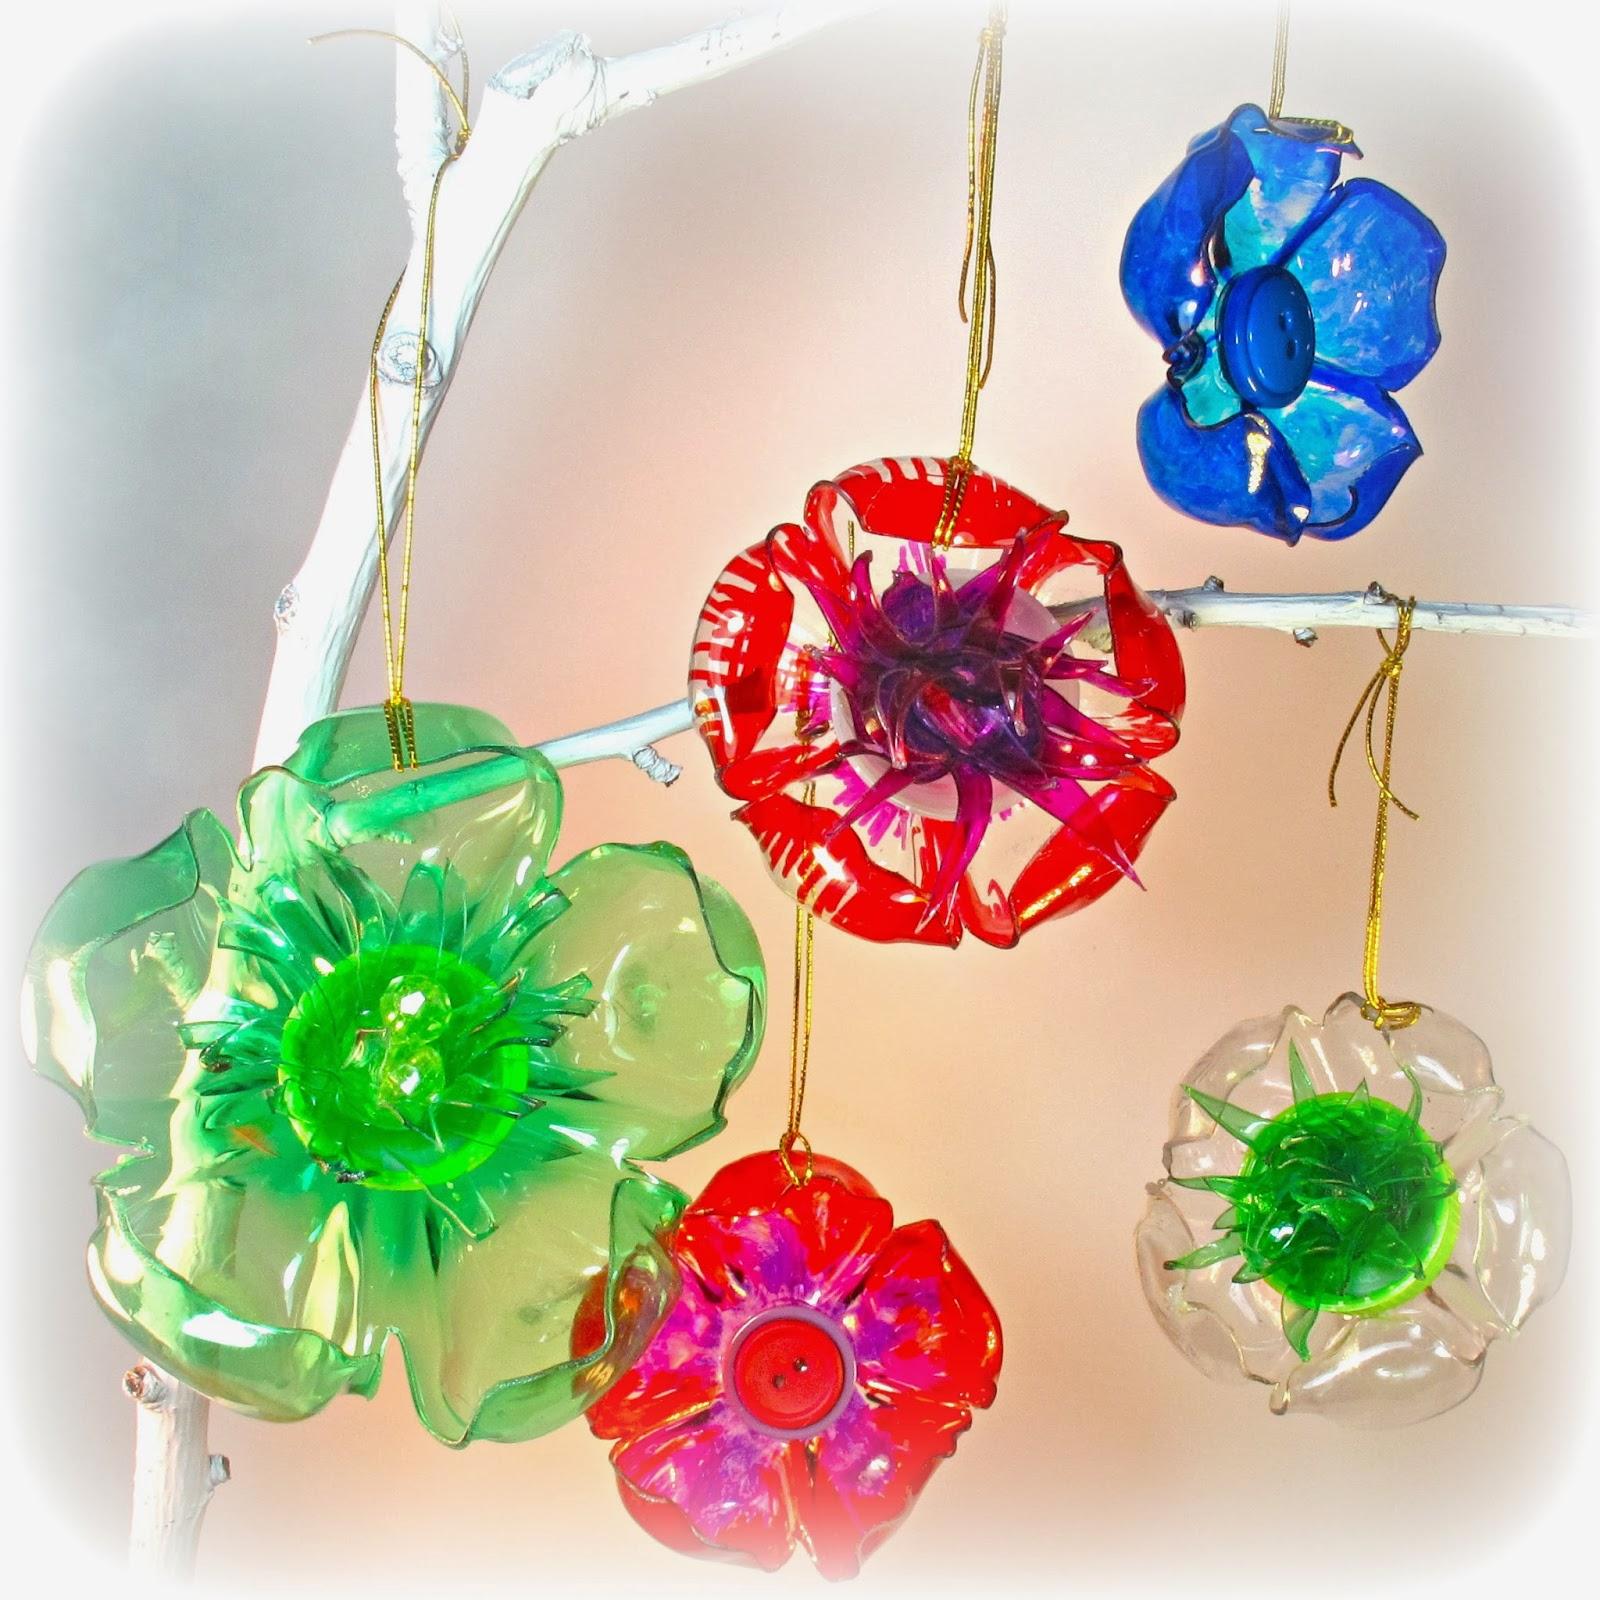 Blukatkraft Diy Recycled Plastic Bottle Crafts Kid S Crafts